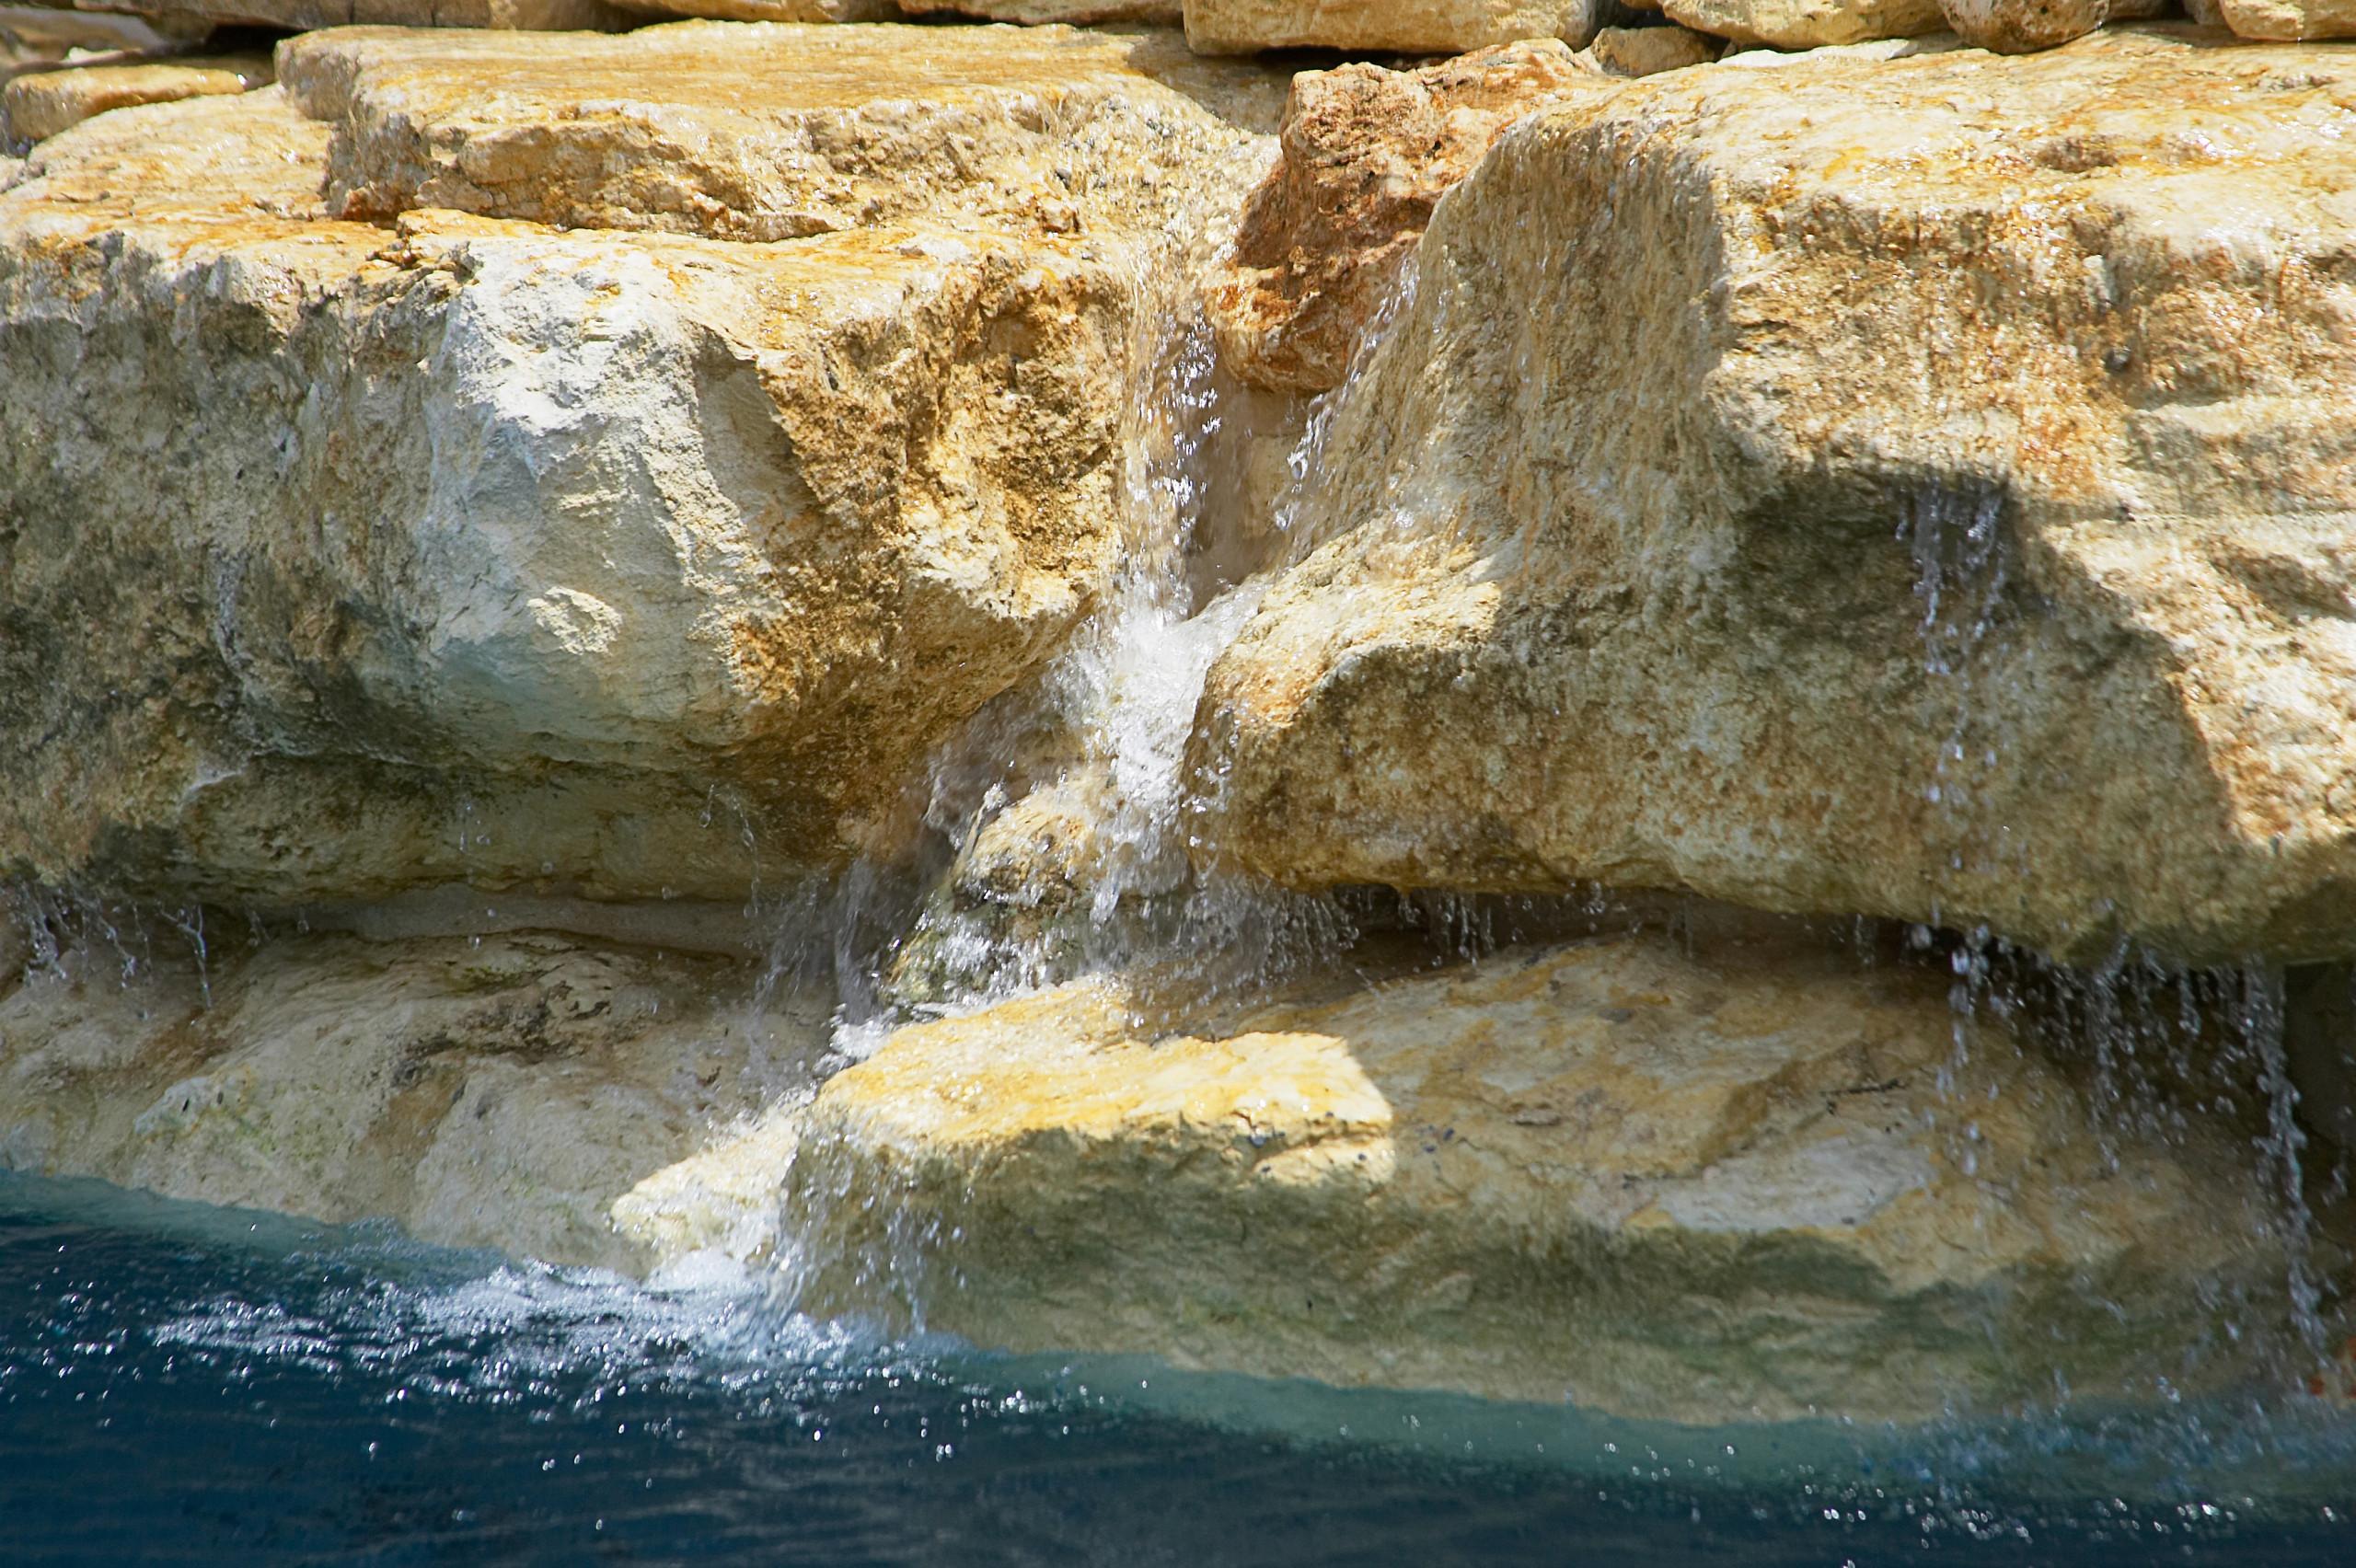 Cordillera Ranch/Boerne Pool/Spa/Beach